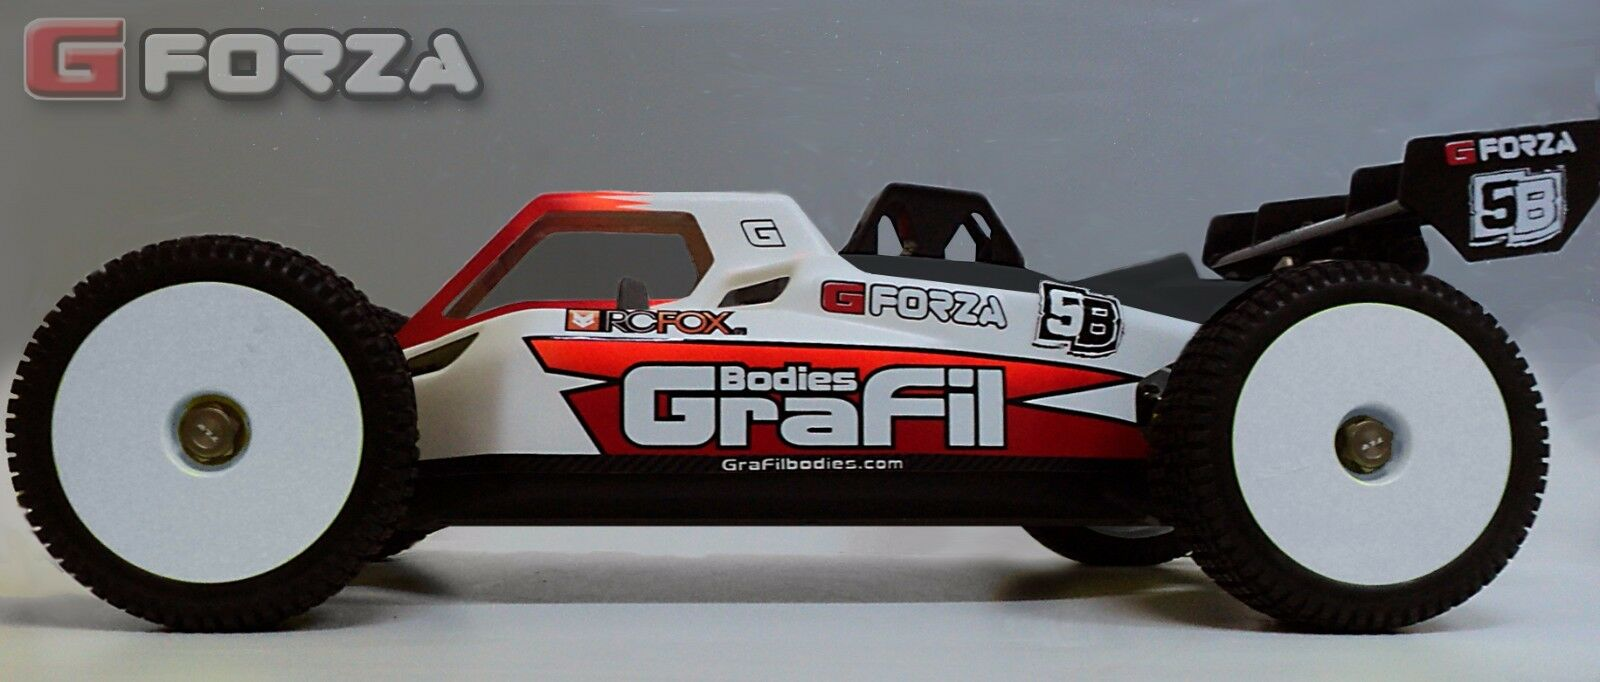 TLR 5ive-B race body - LOSI 5B -  G-Forza  PROMO price by GraFil Bodies